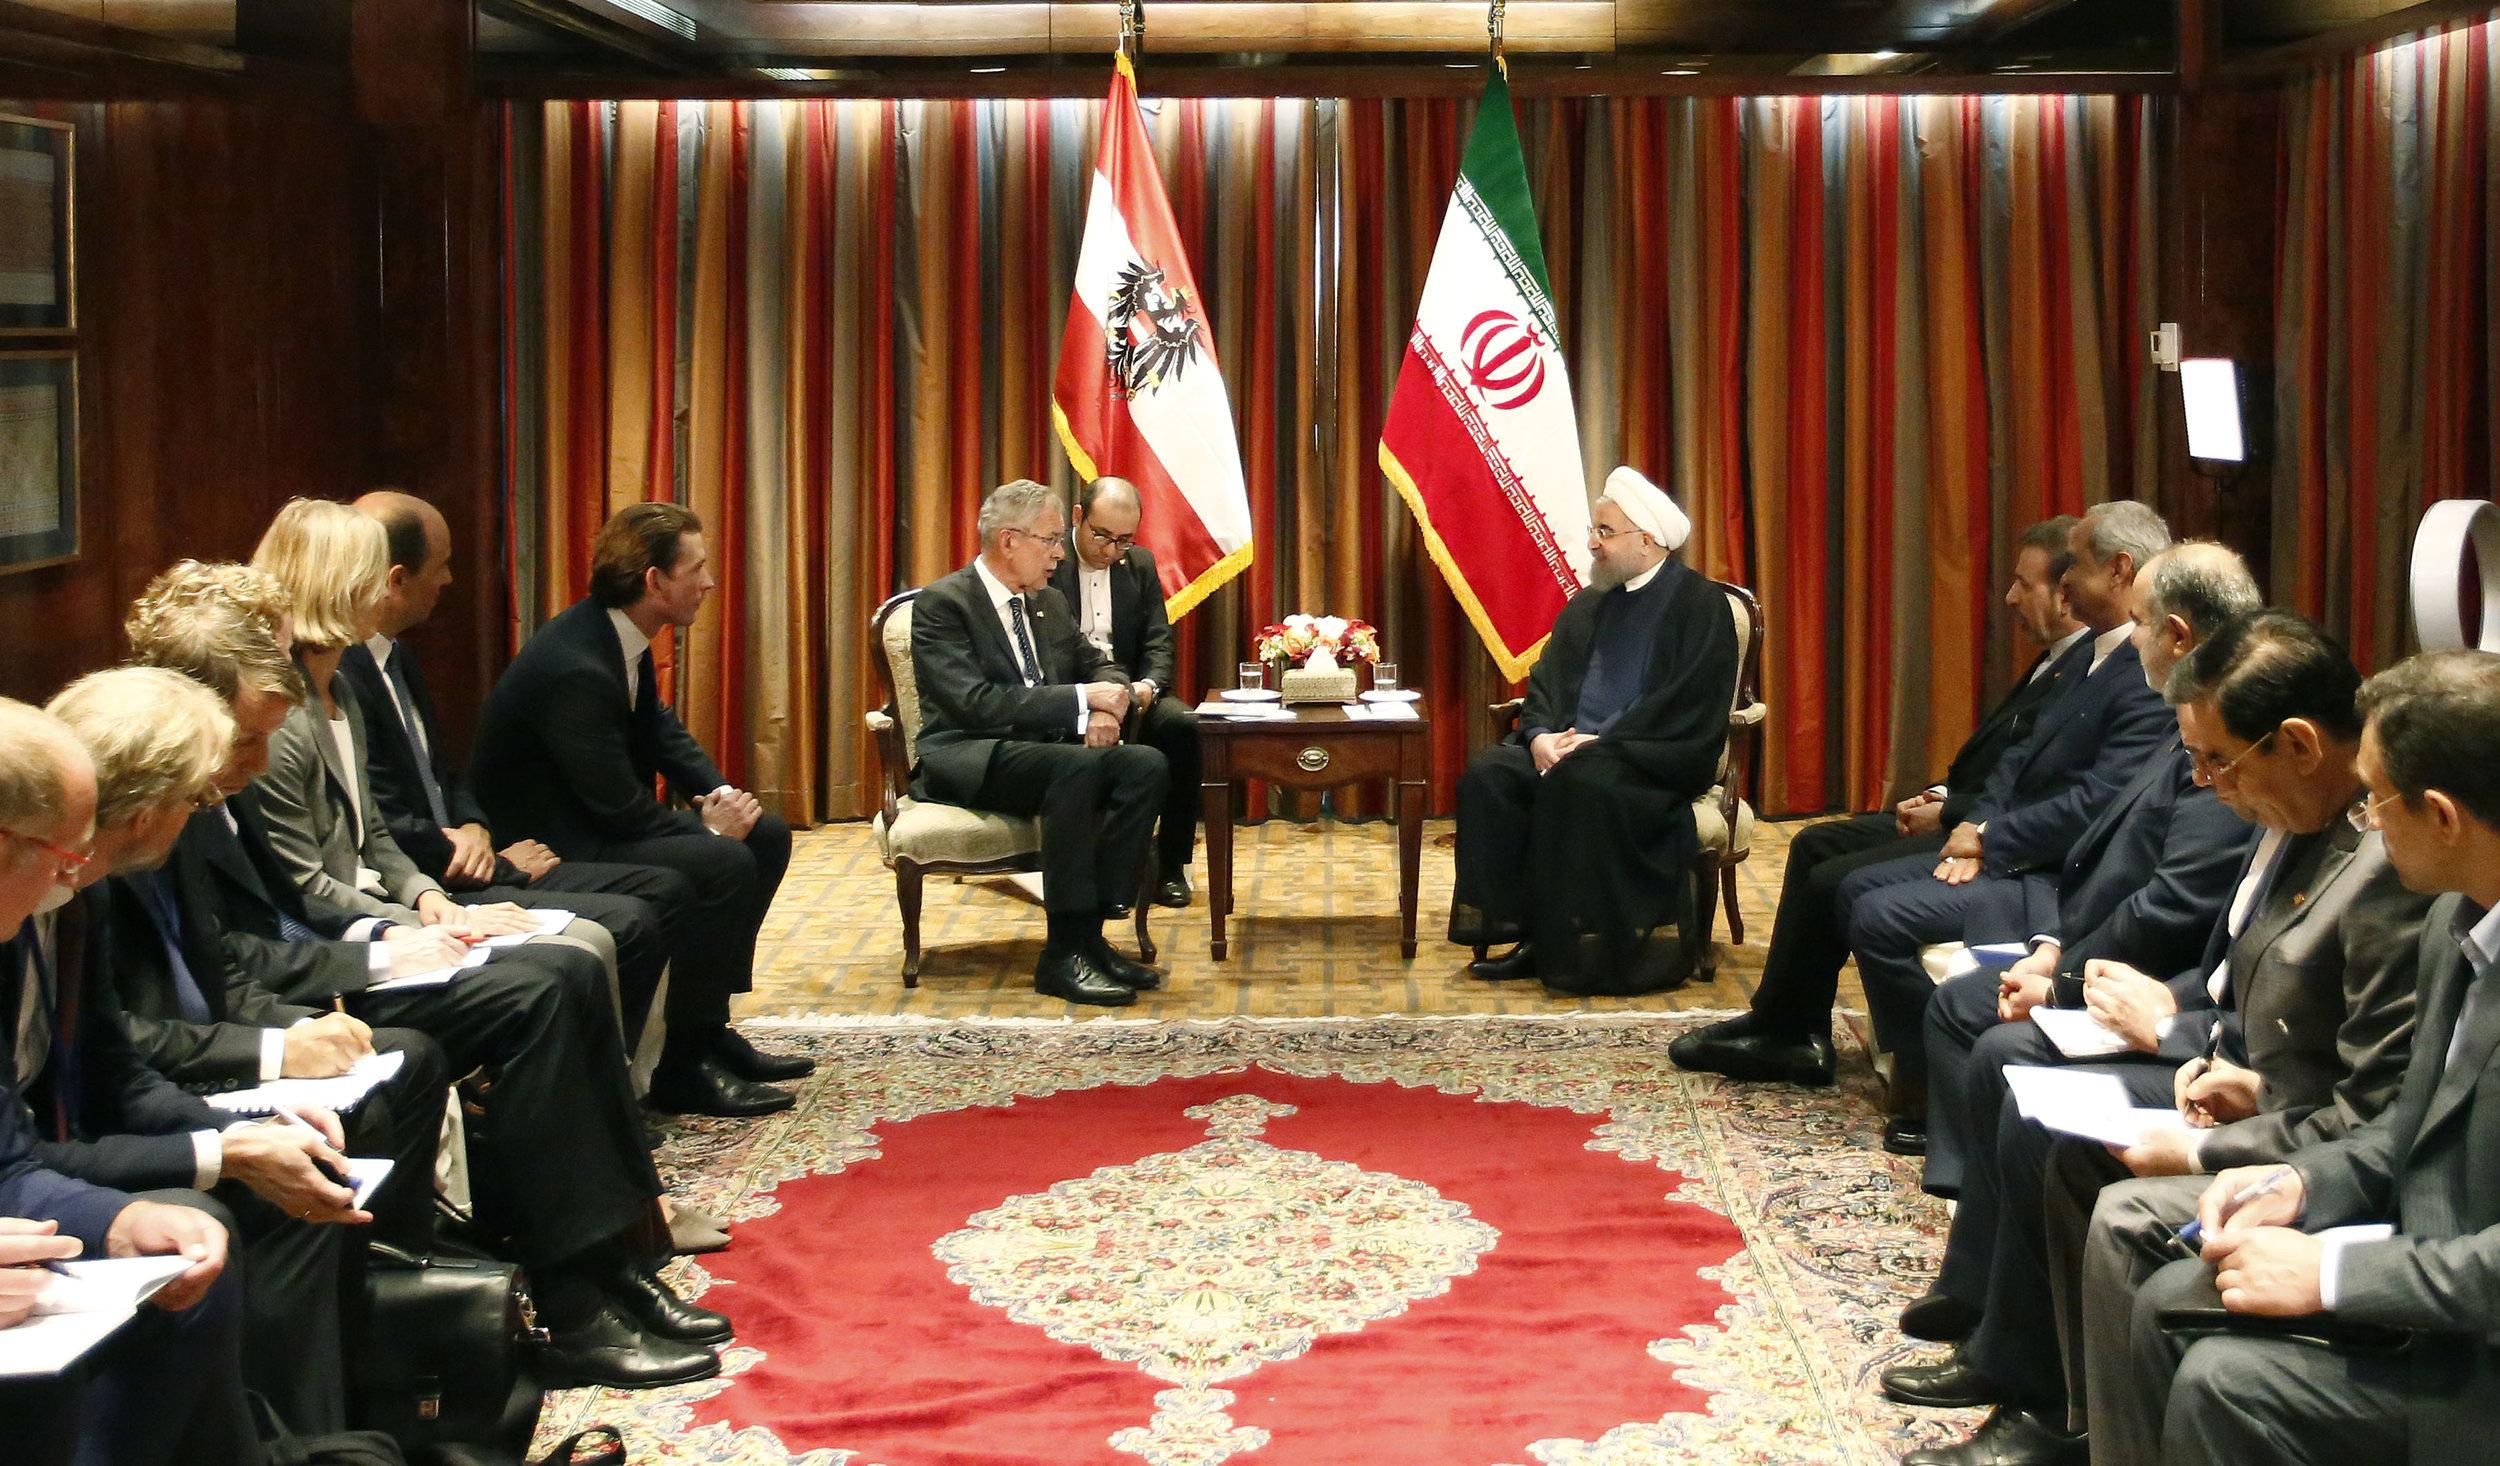 President Alexander Van der Bellen and Foreign Minister Sebastian Kurz meet with President Hassan Rouhani of Iran, Photo: Dragan Tatic